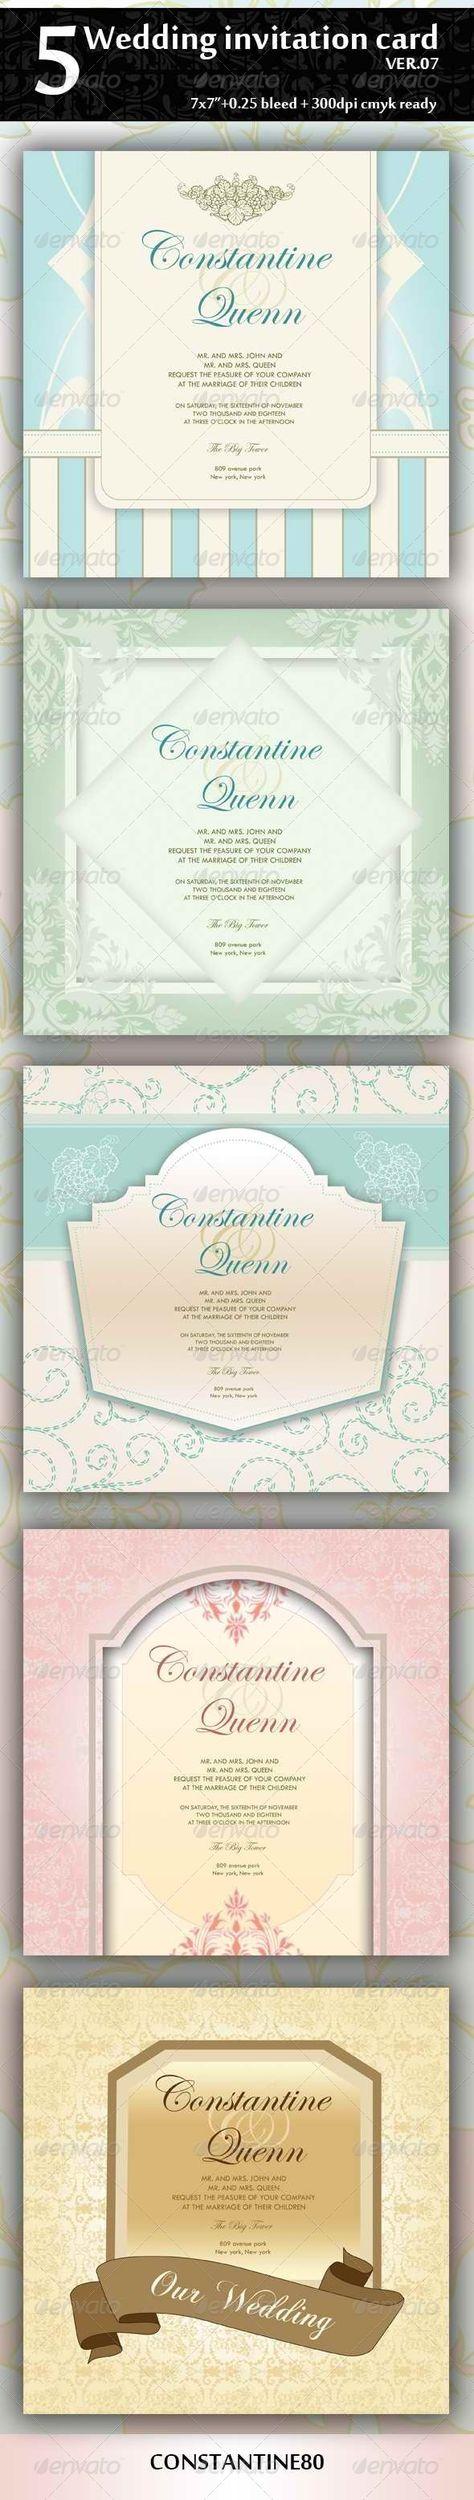 Wedding Invitation Photoshop Invitations And